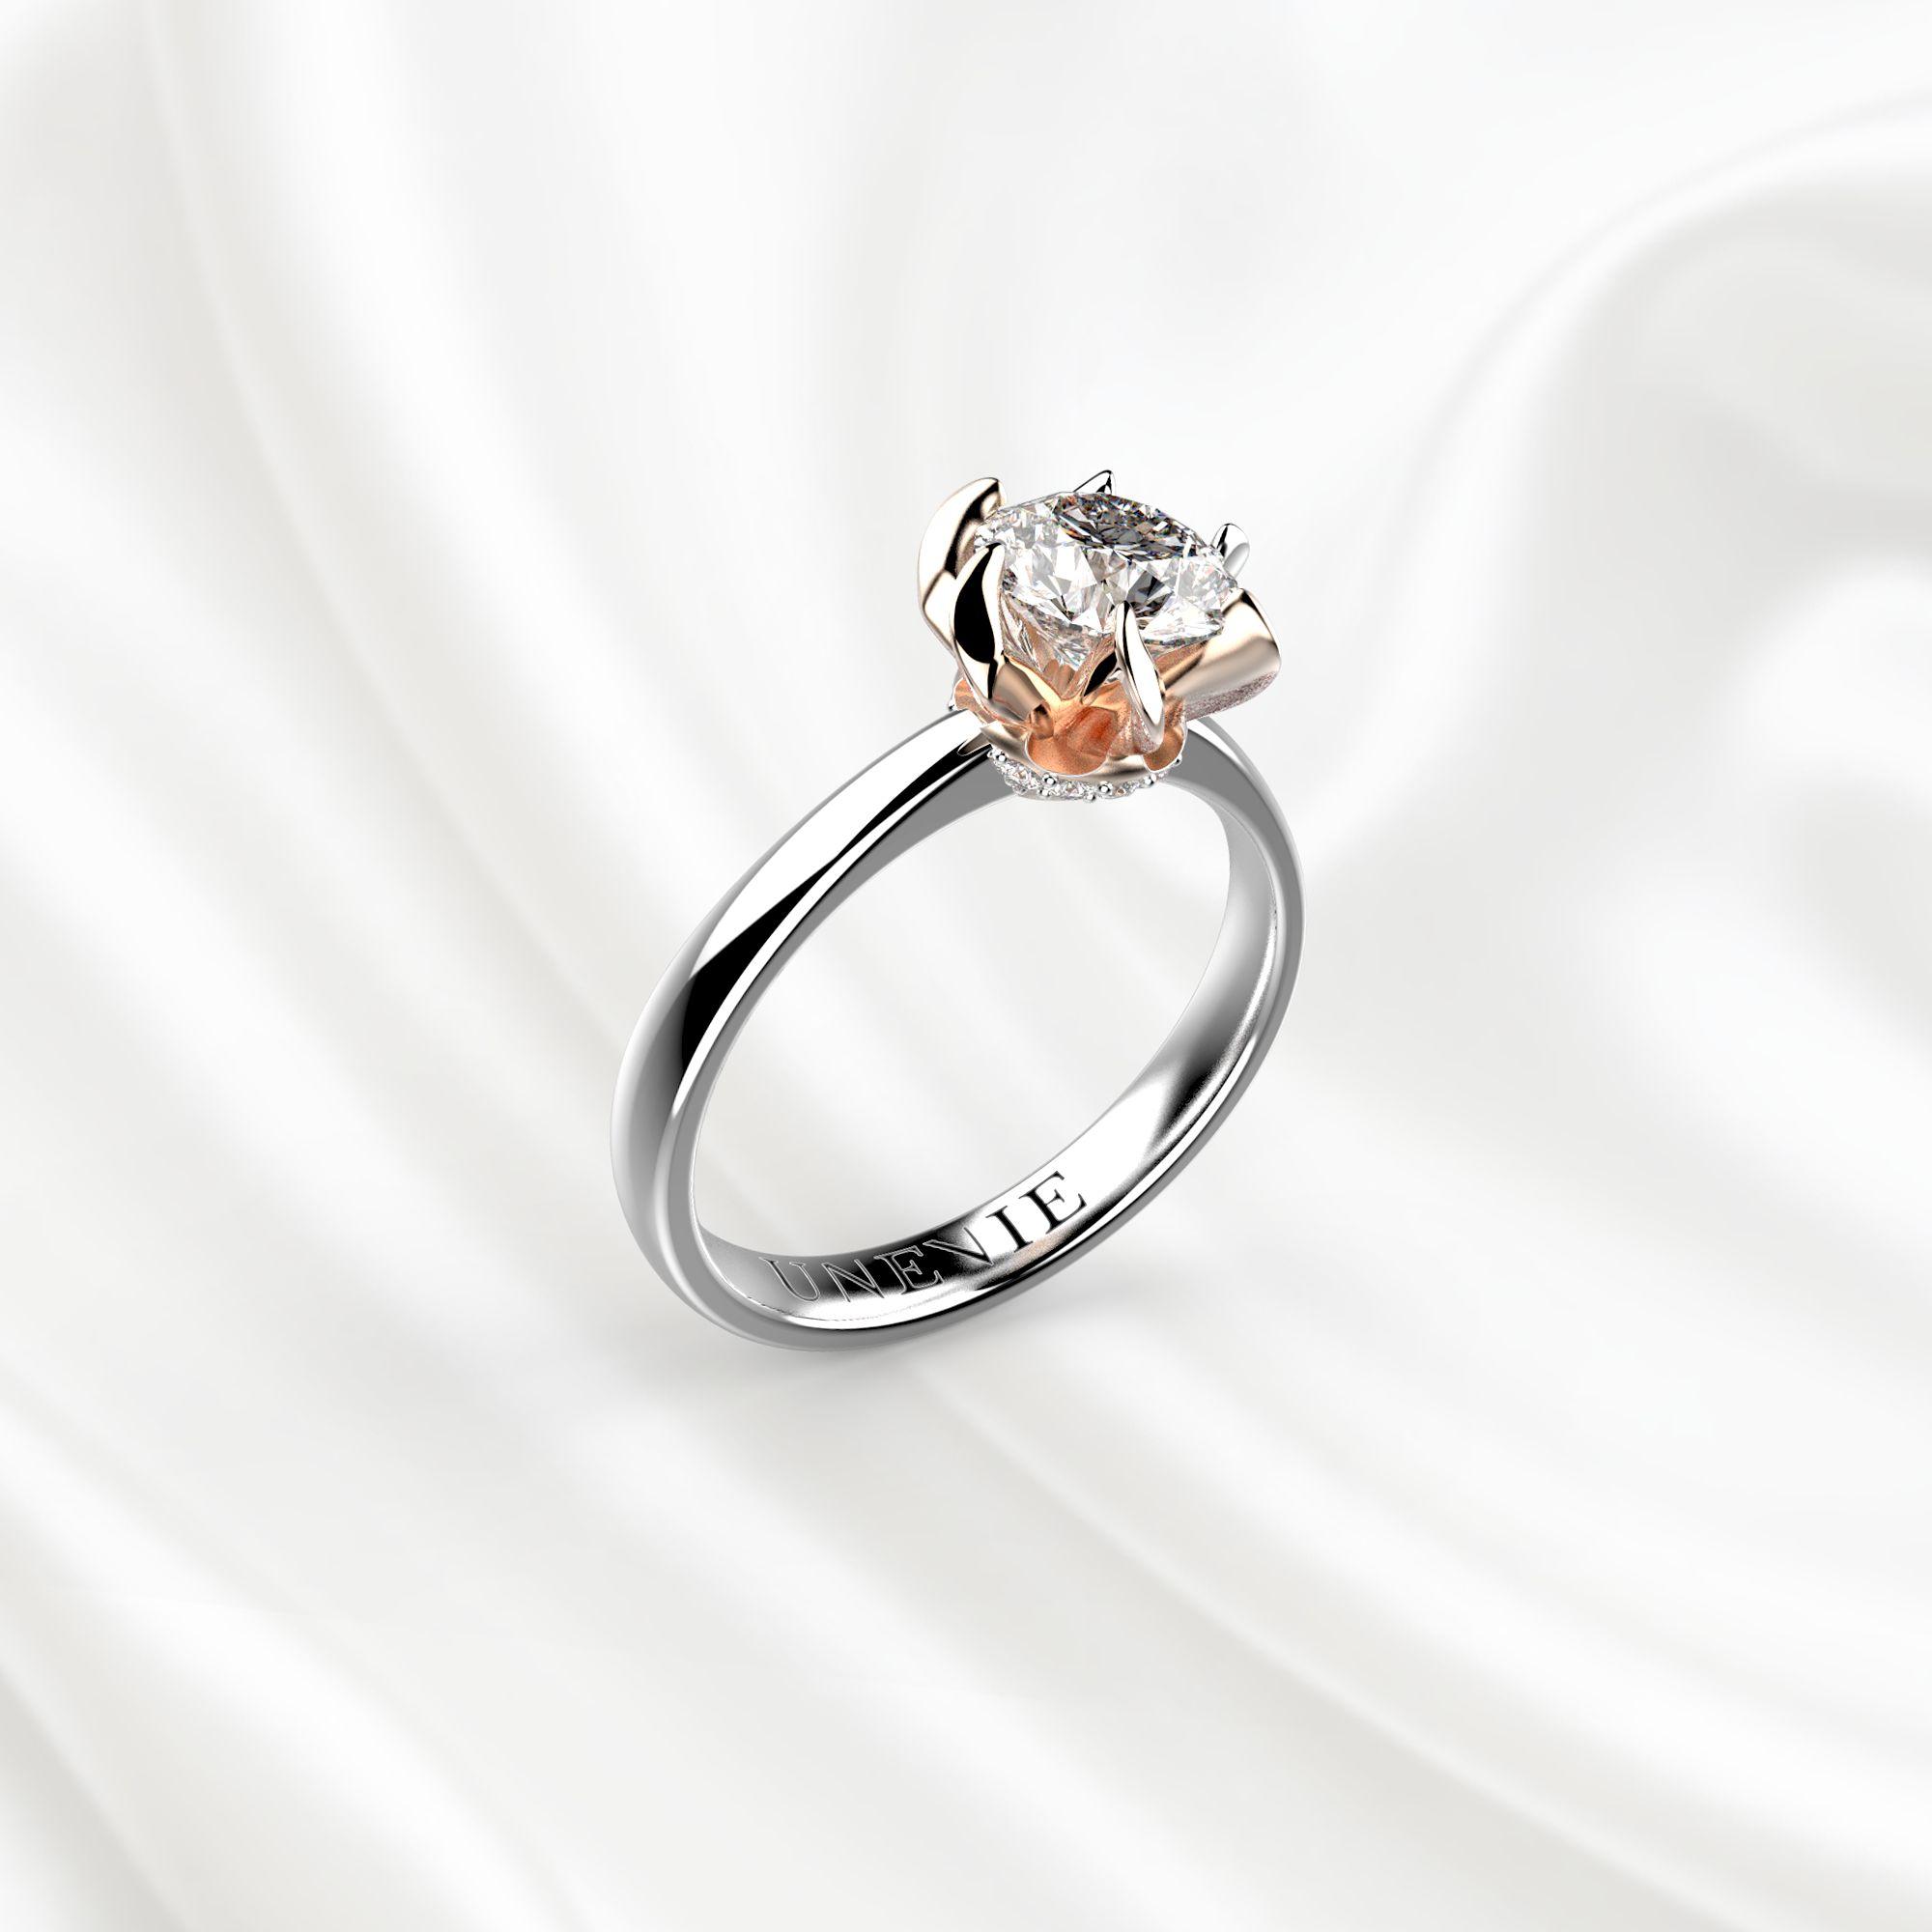 N11 Помолвочное кольцо из бело-розового золота с бриллиантом 0.7 карат